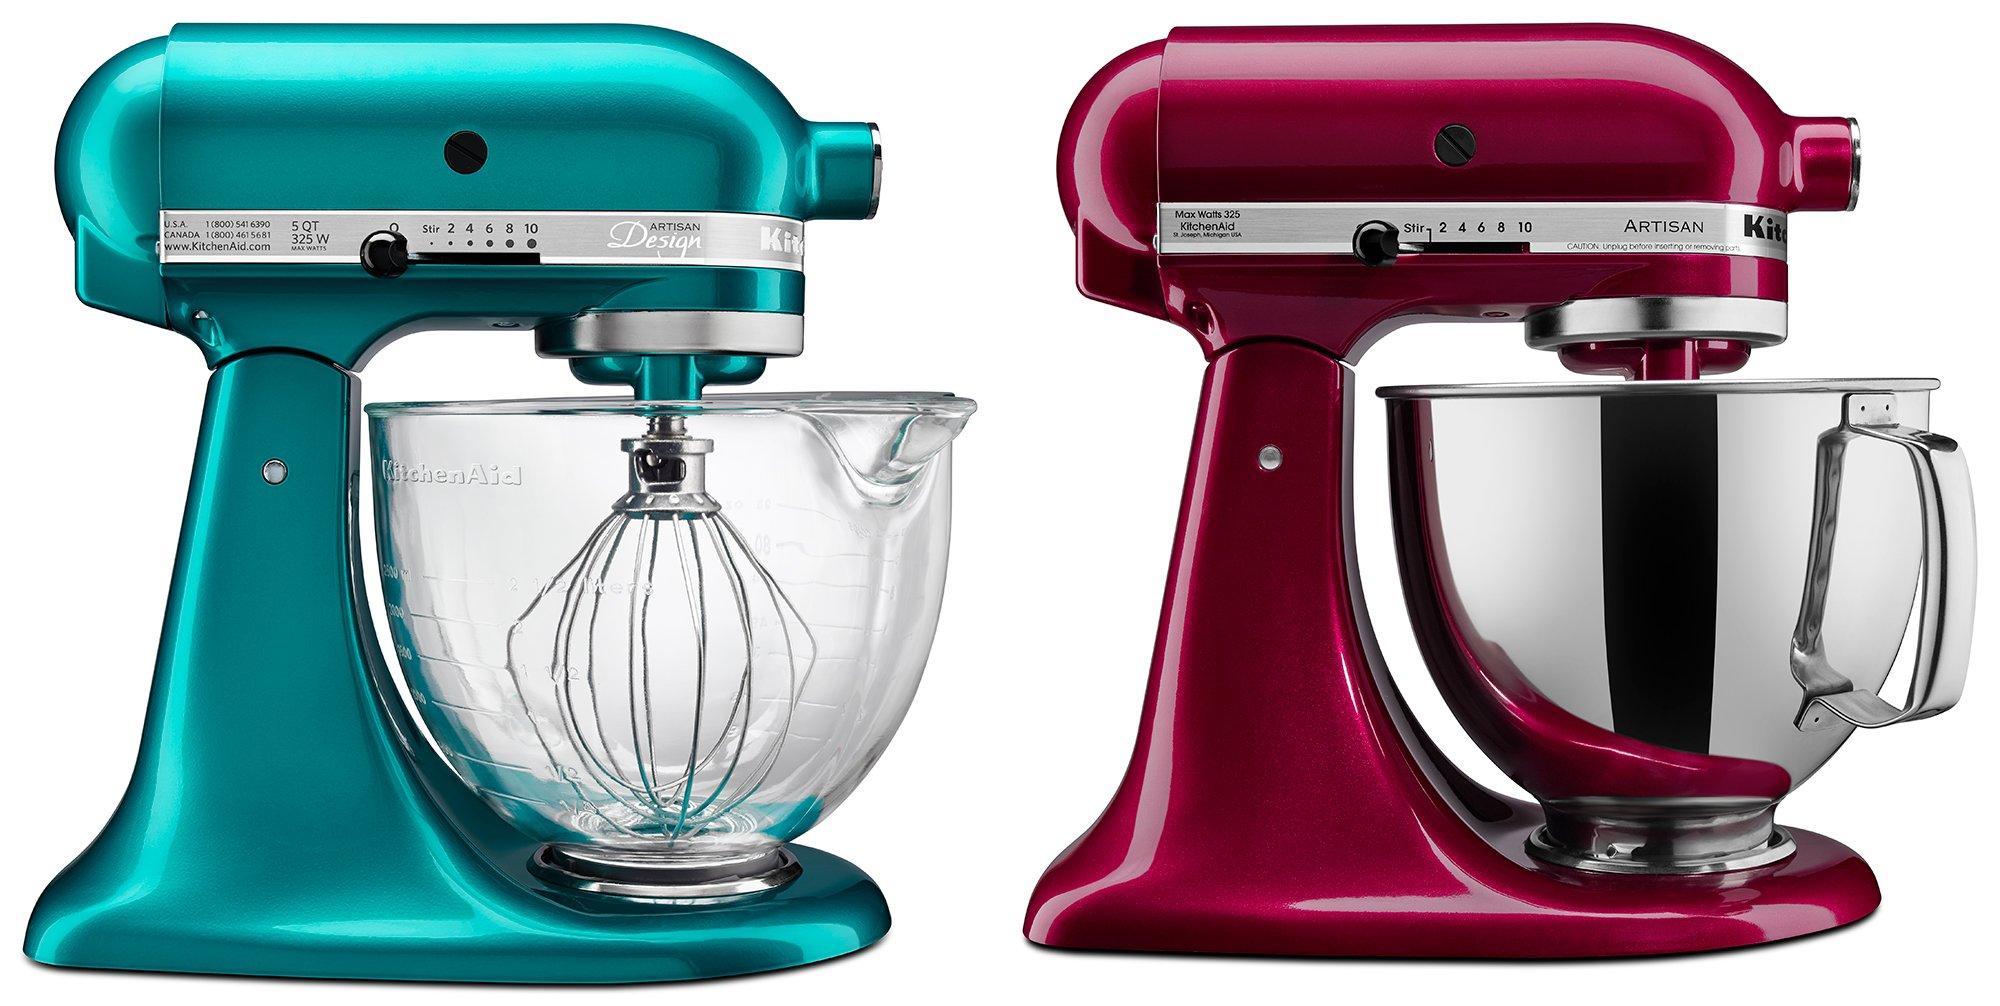 KitchenAid\'s New Mixer Colors for 2014: Sea Glass, Bordeaux ...